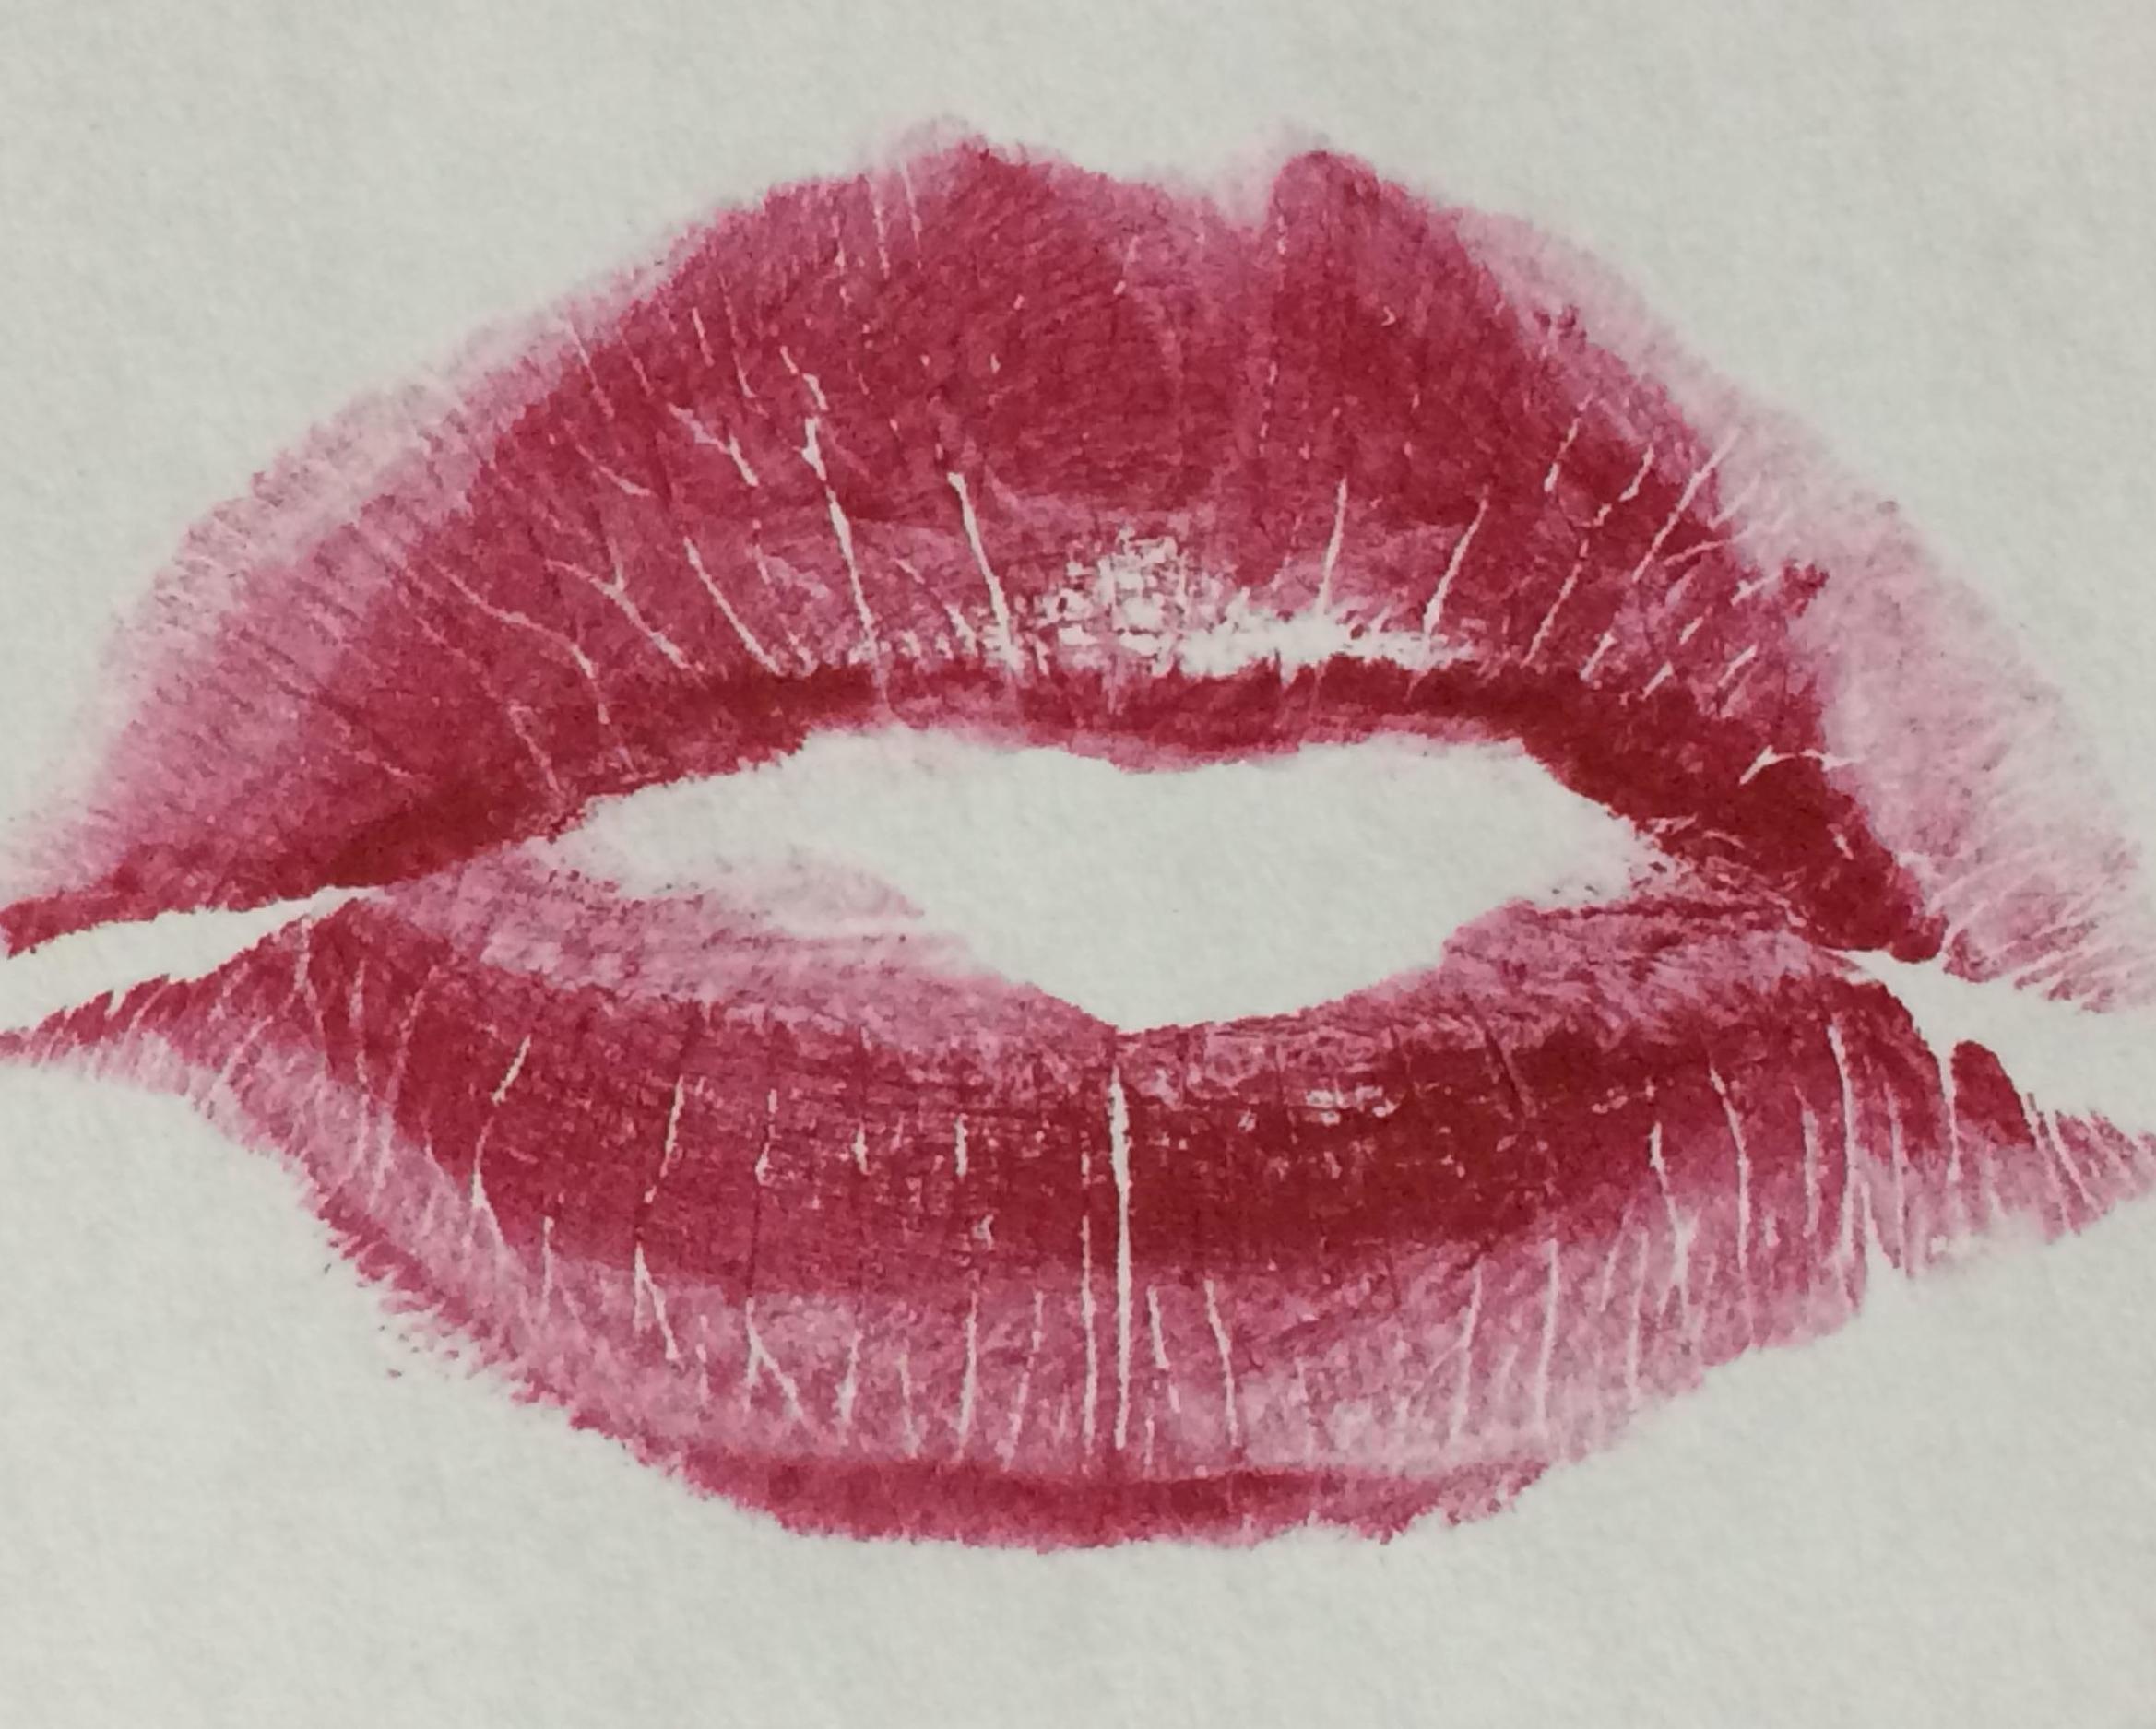 Cheek kissing etiquette